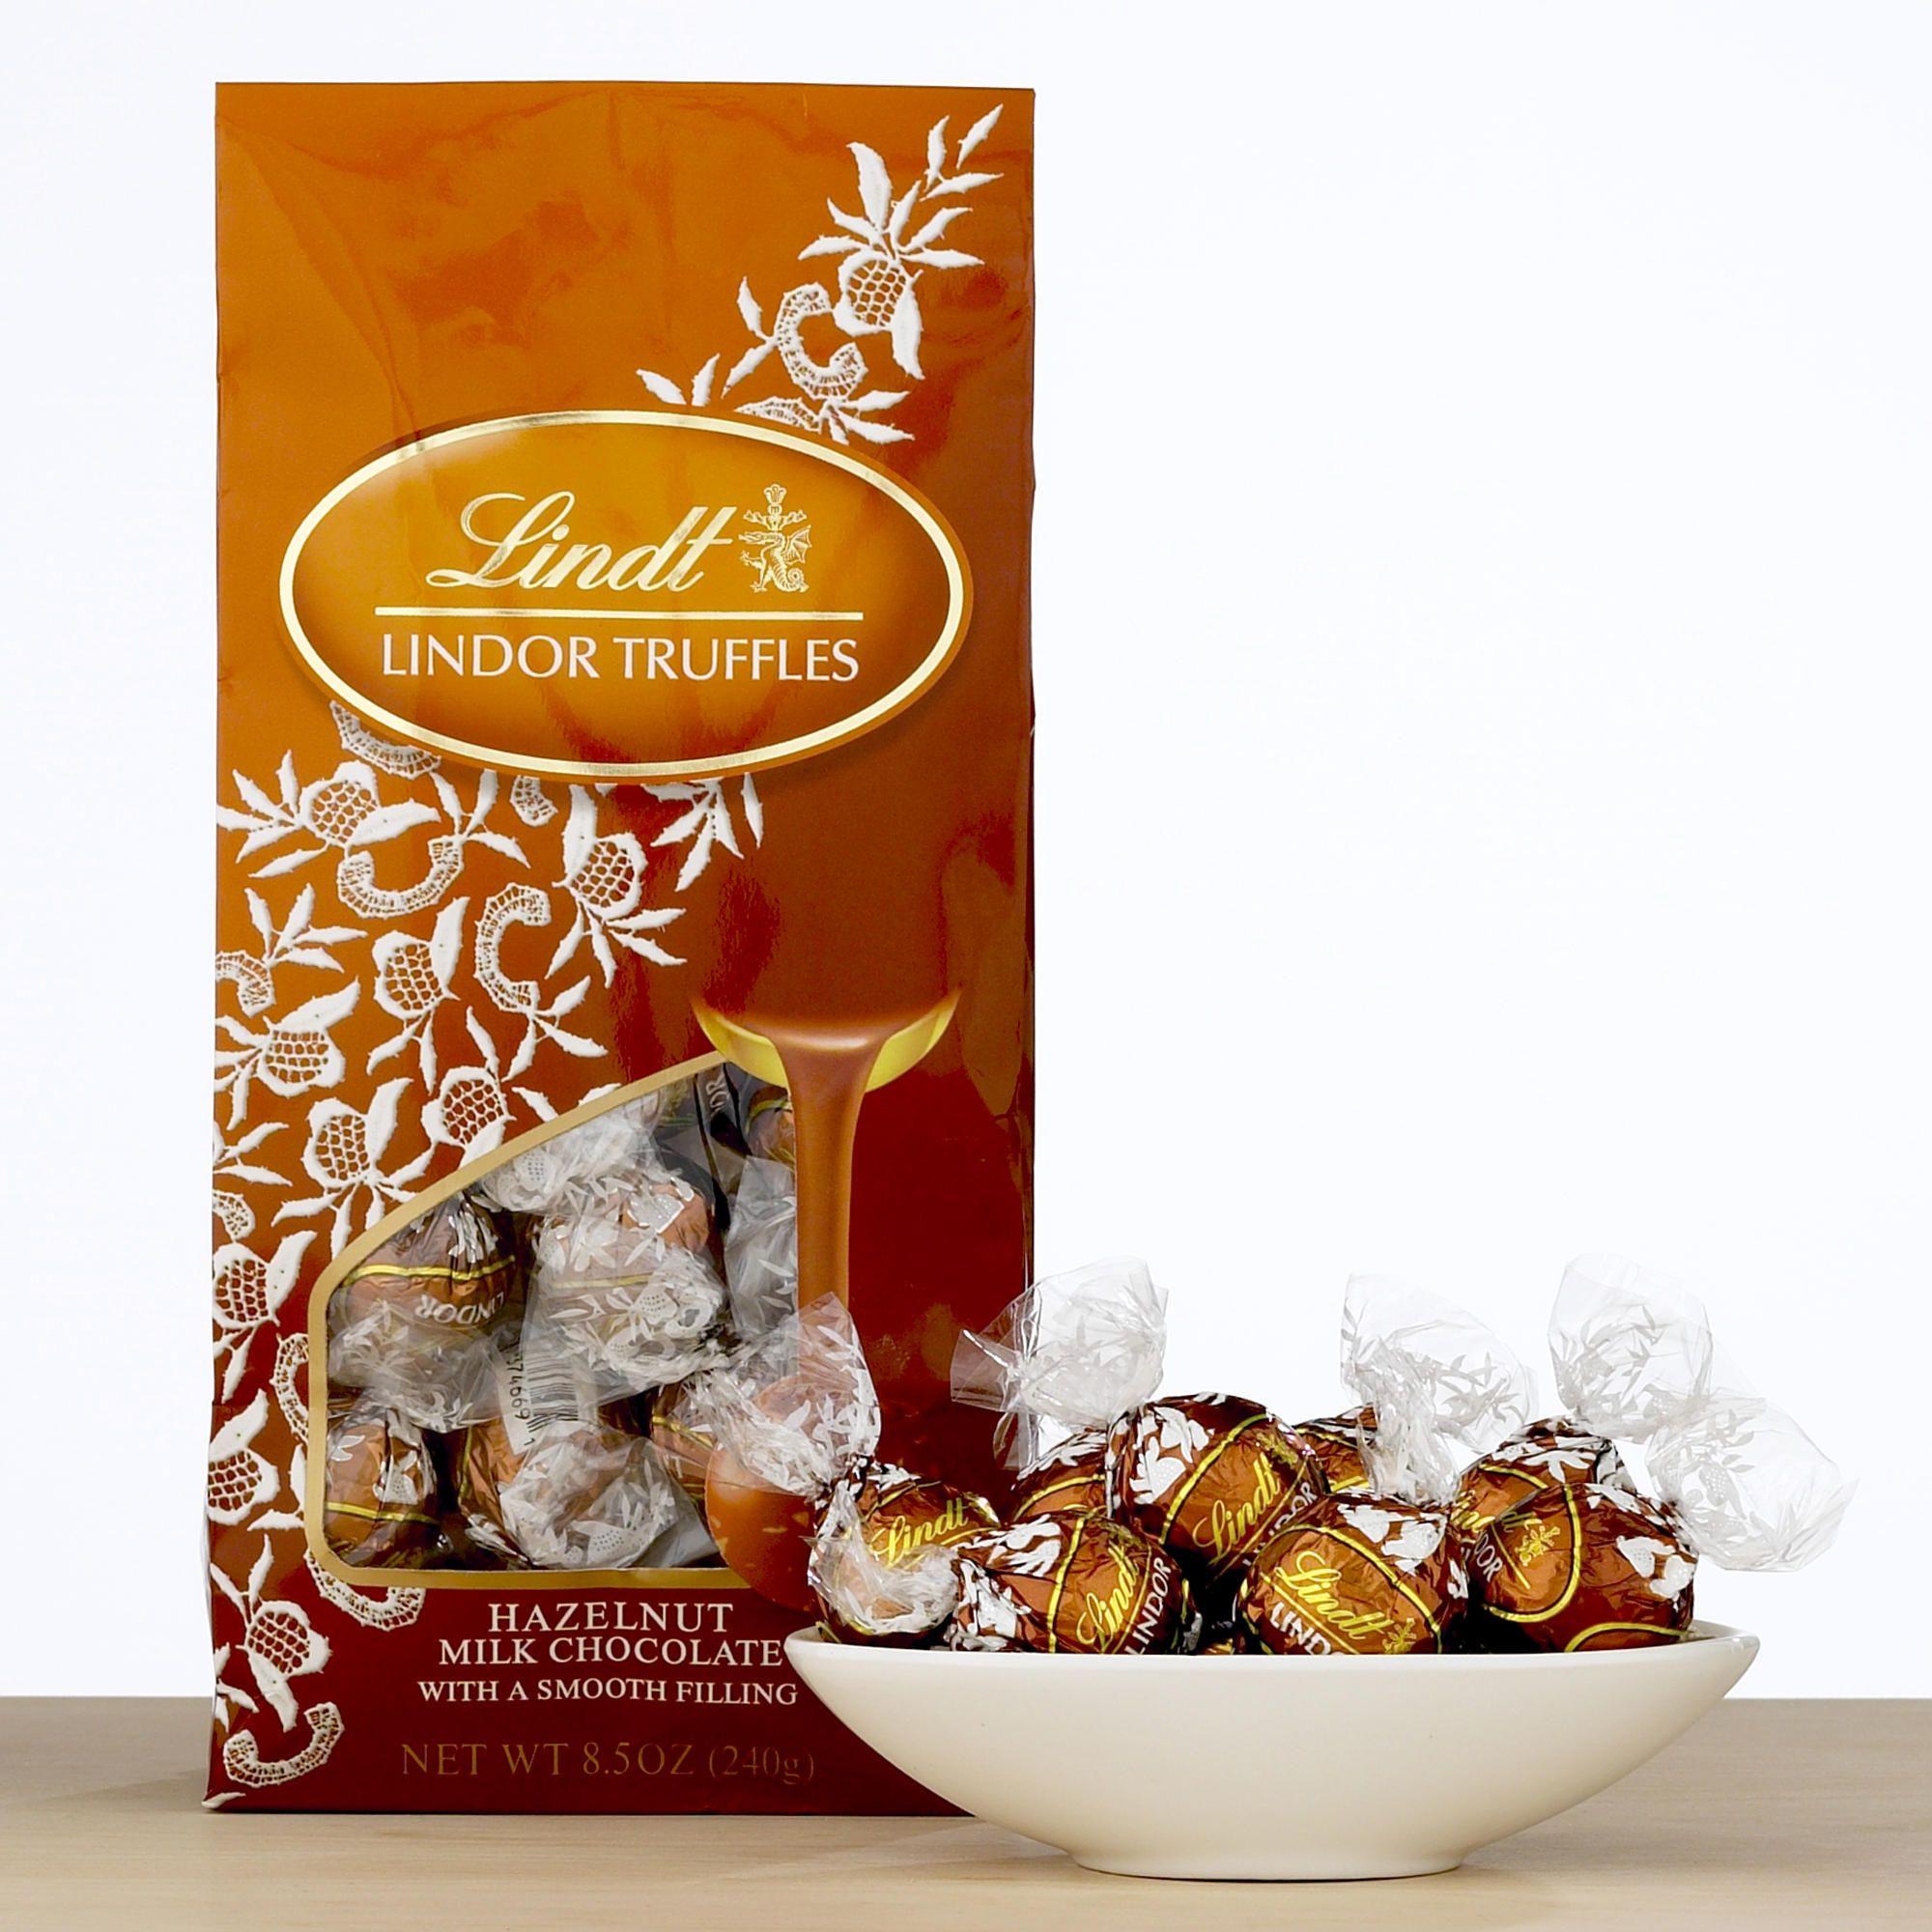 LINDT HAZELNUT MILK CHOCOLATE LINDOR TRUFFLES $4.19 | Yummy food ...